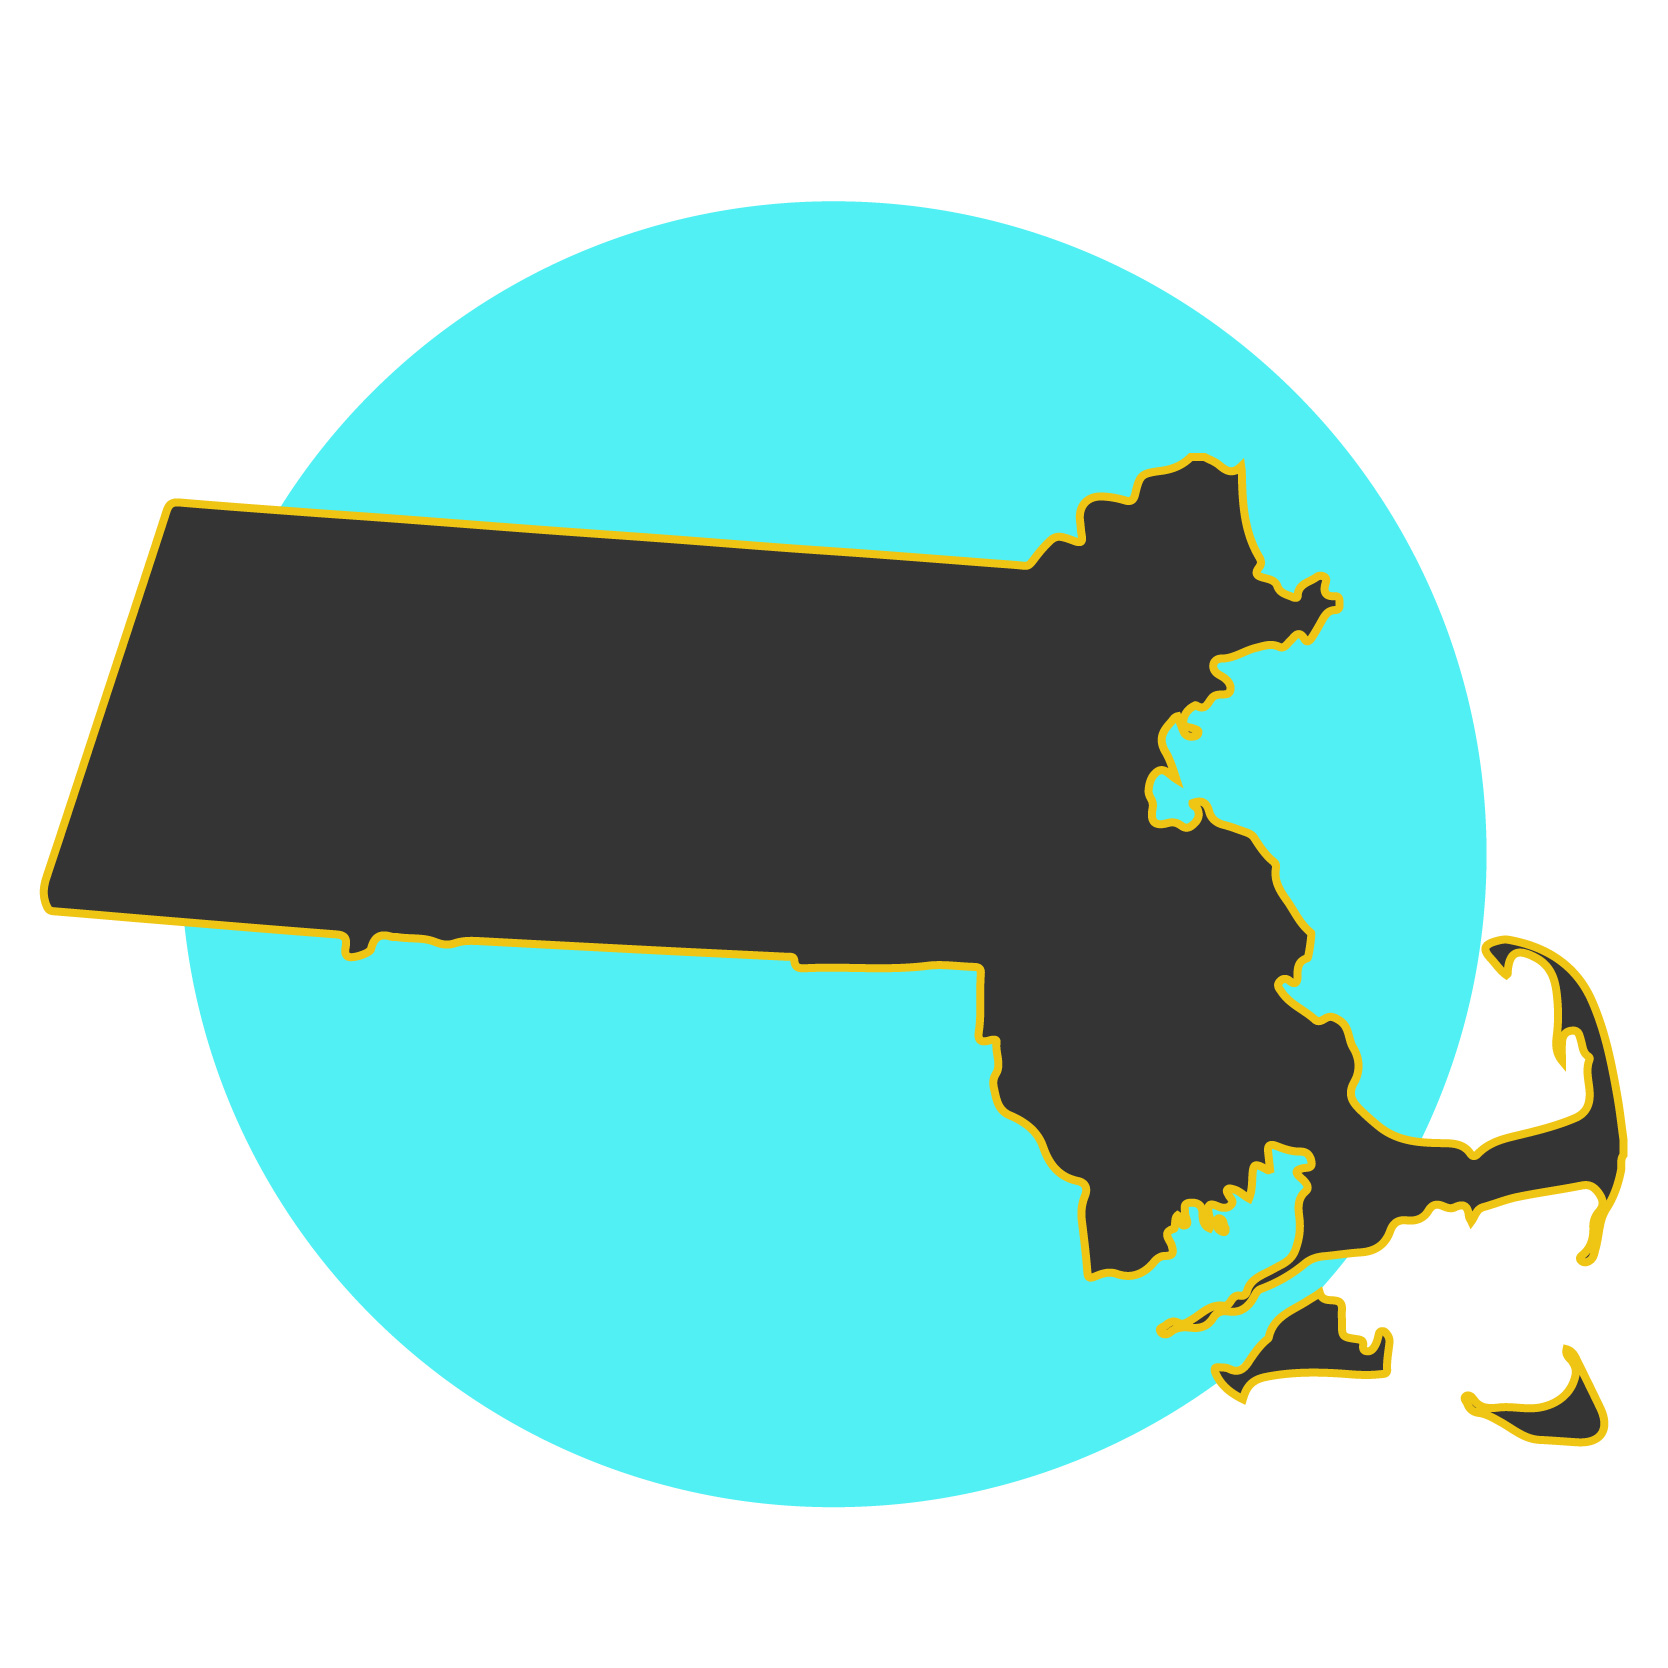 Massachusetts Digital Fundraising State